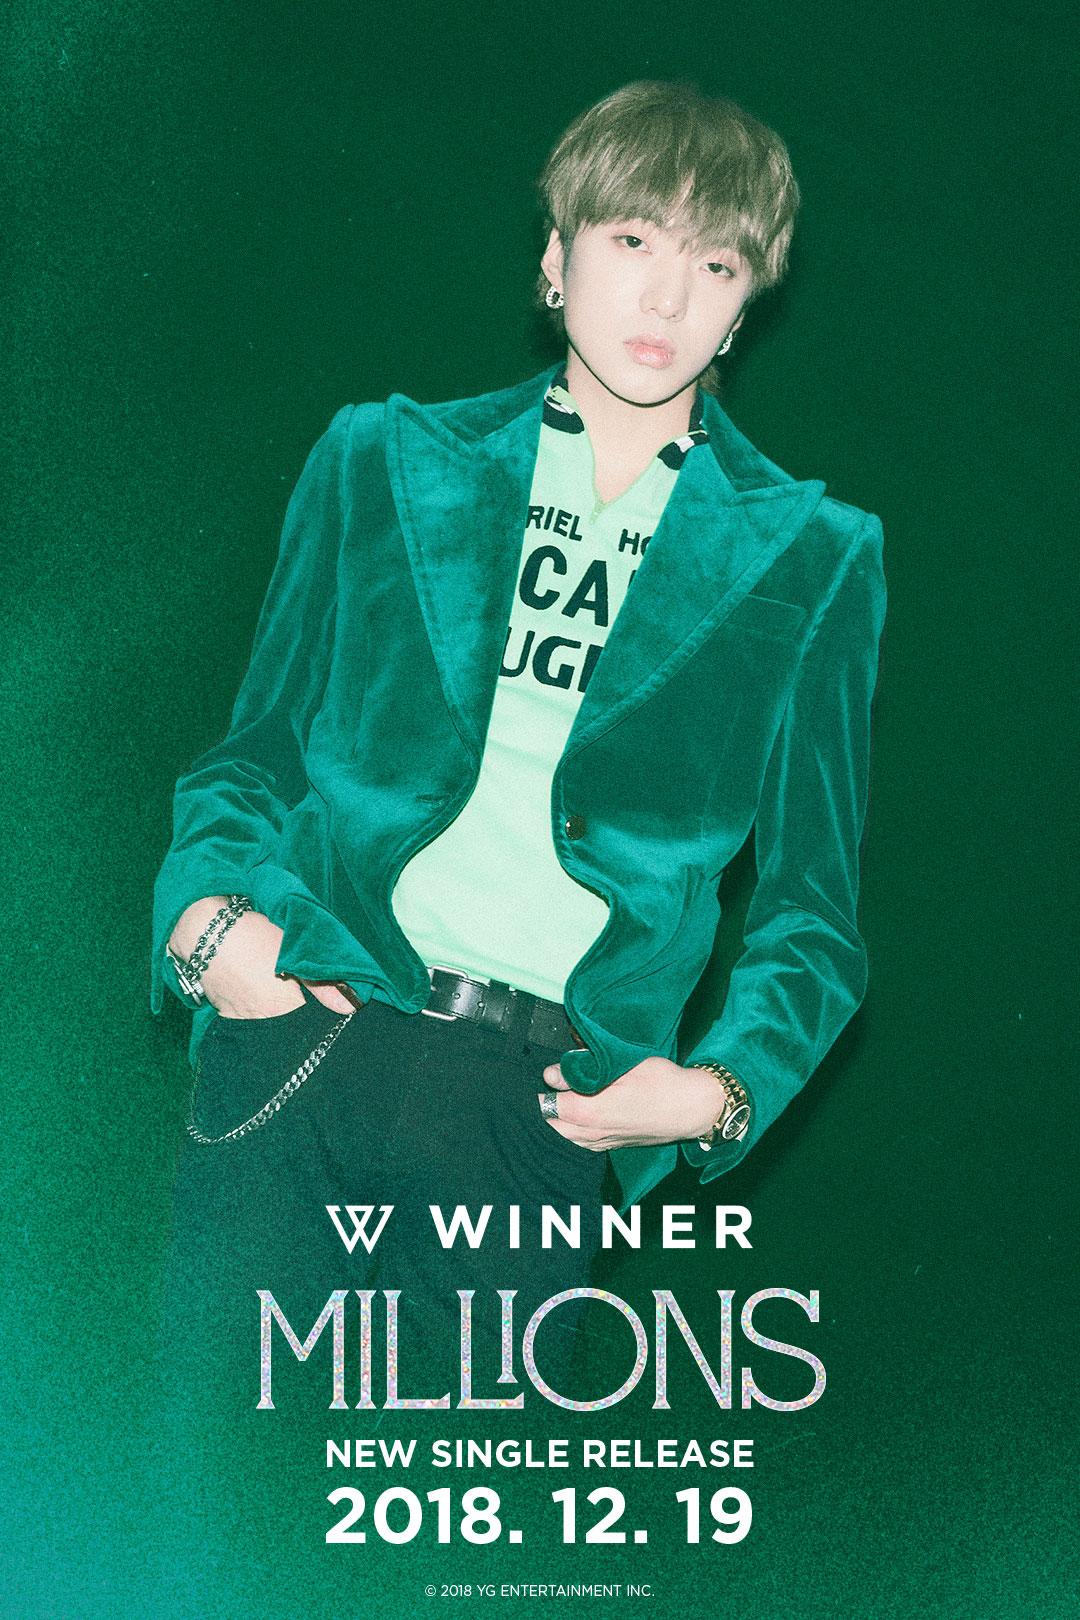 WINNER_MILLIONS_YOON